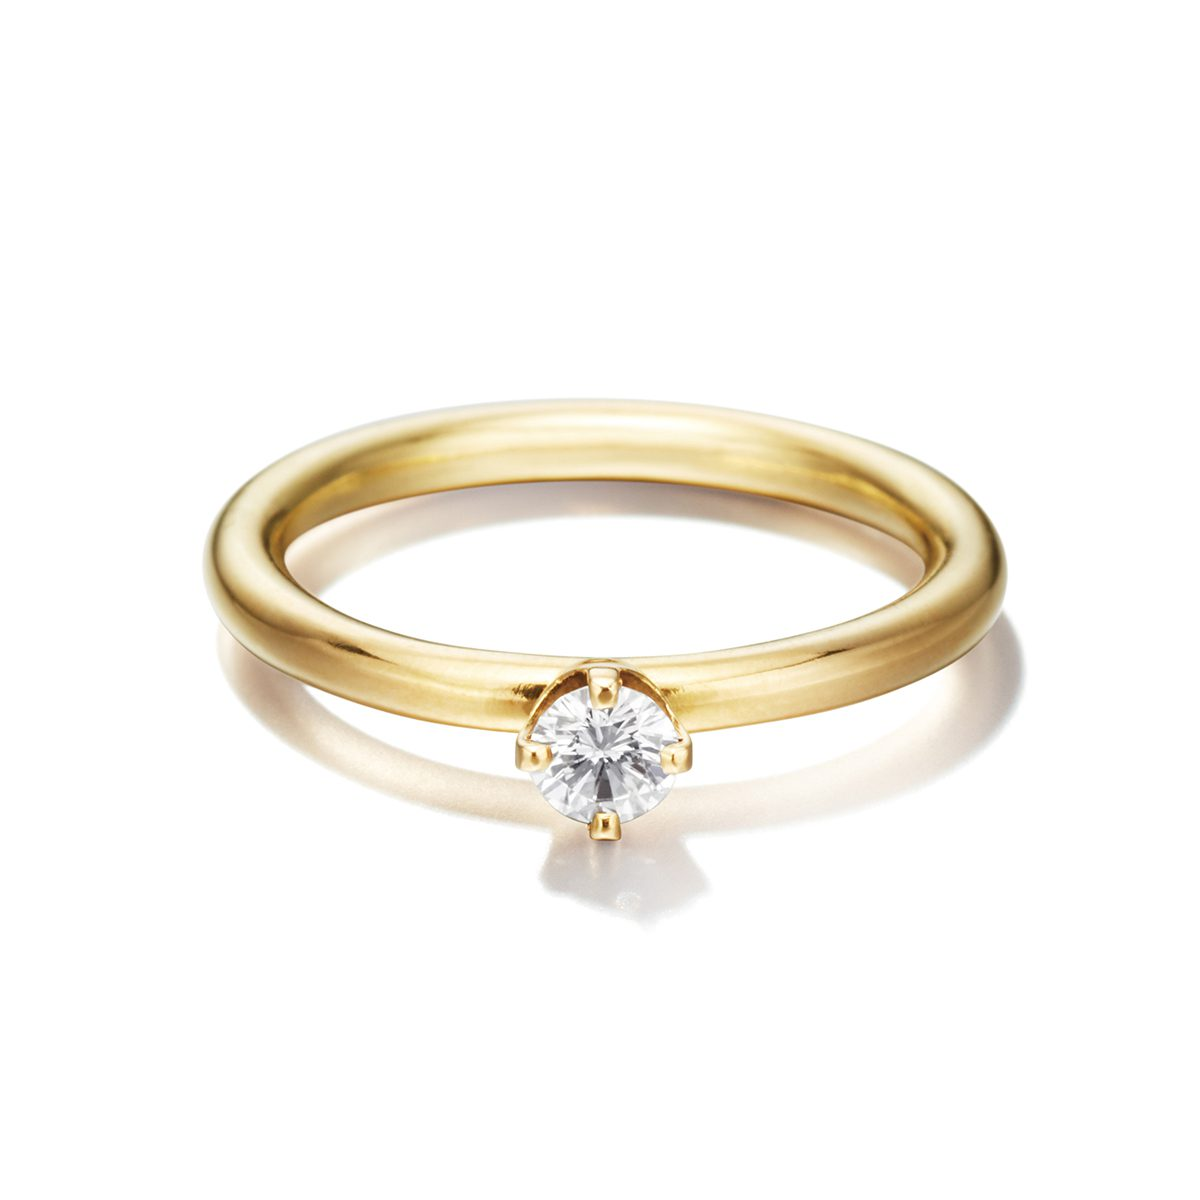 Sweat Pea Gloriana|Engagement Rings